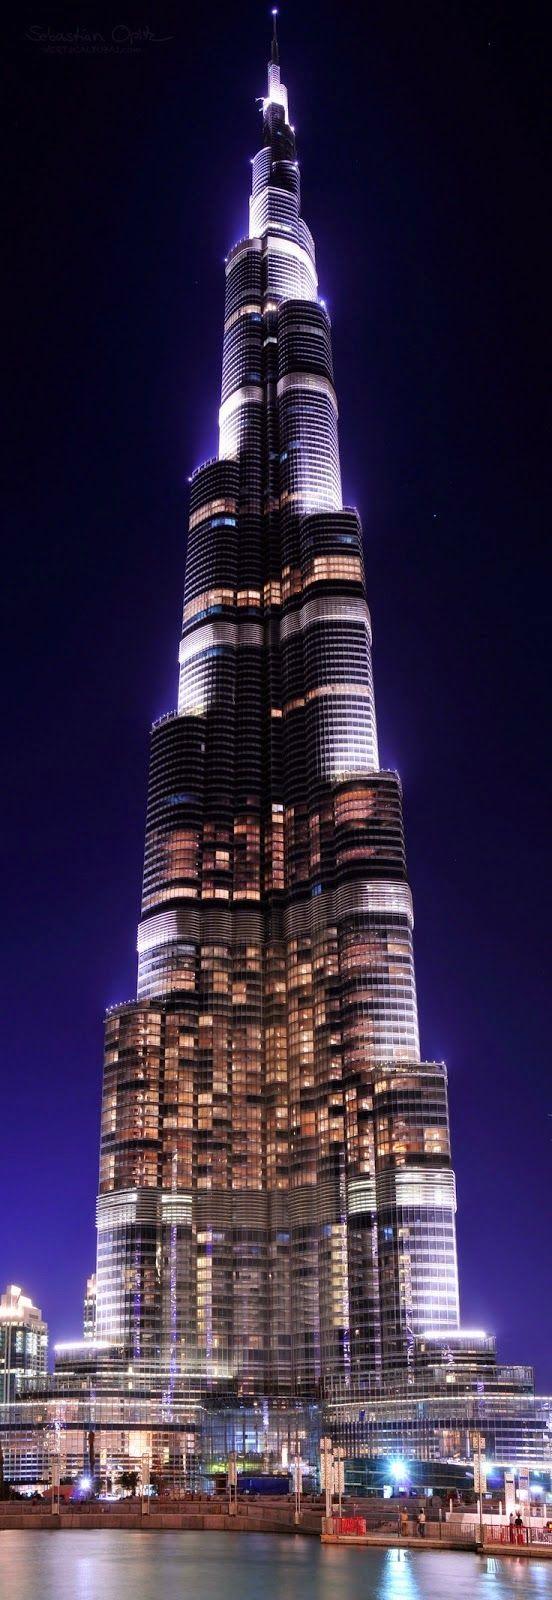 Panorama of Burj Khalifa